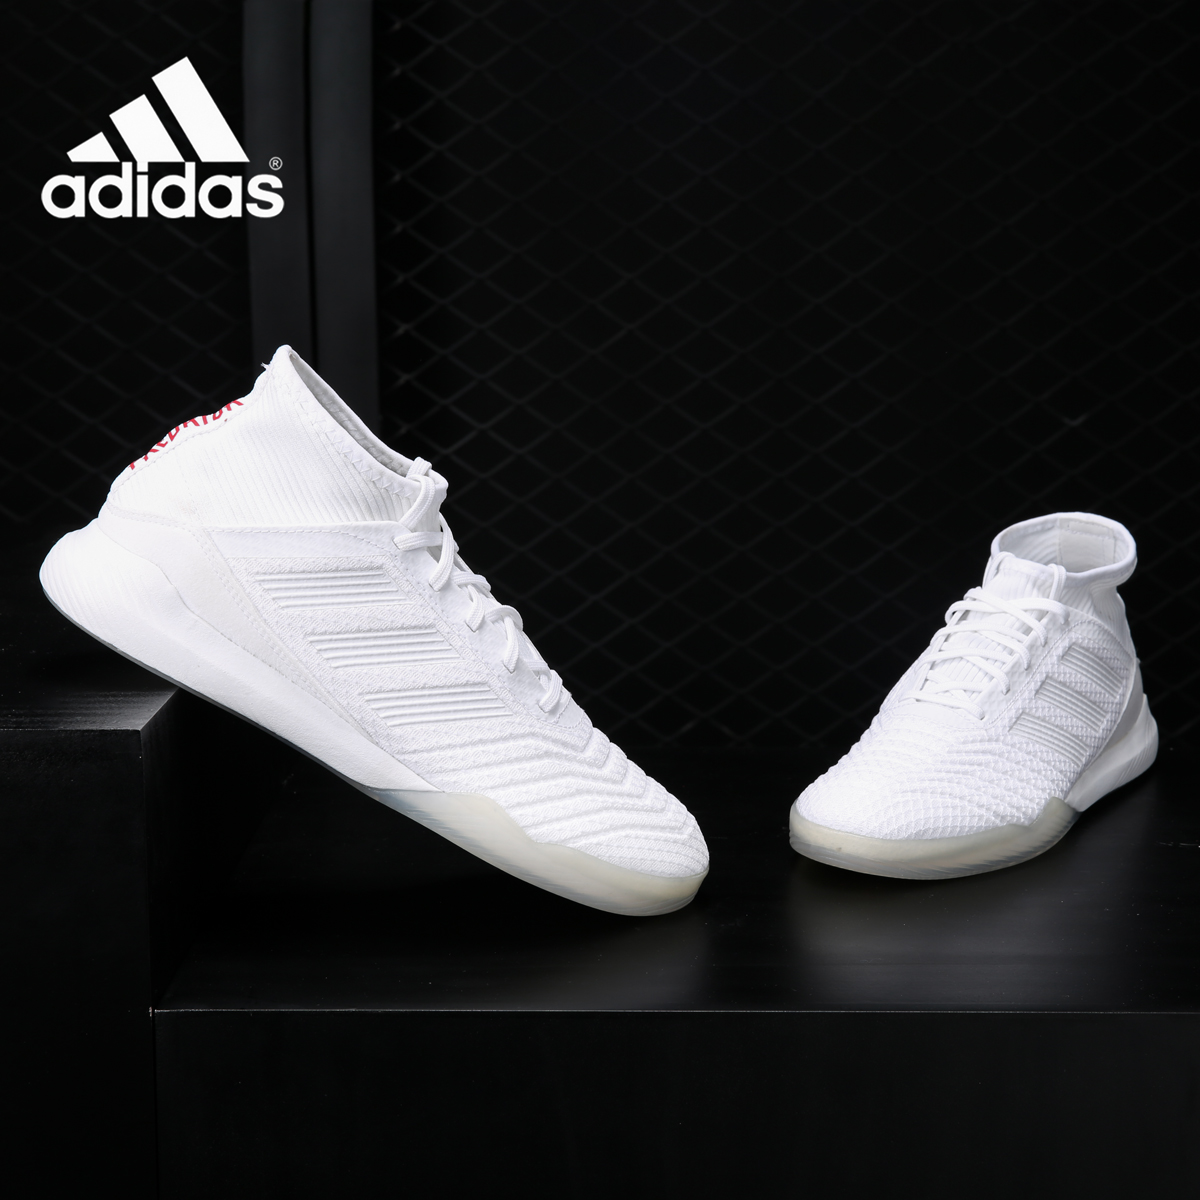 Adidas/阿迪达斯正品 Predator 18.3 IN猎鹰街头休闲足球鞋CM7703